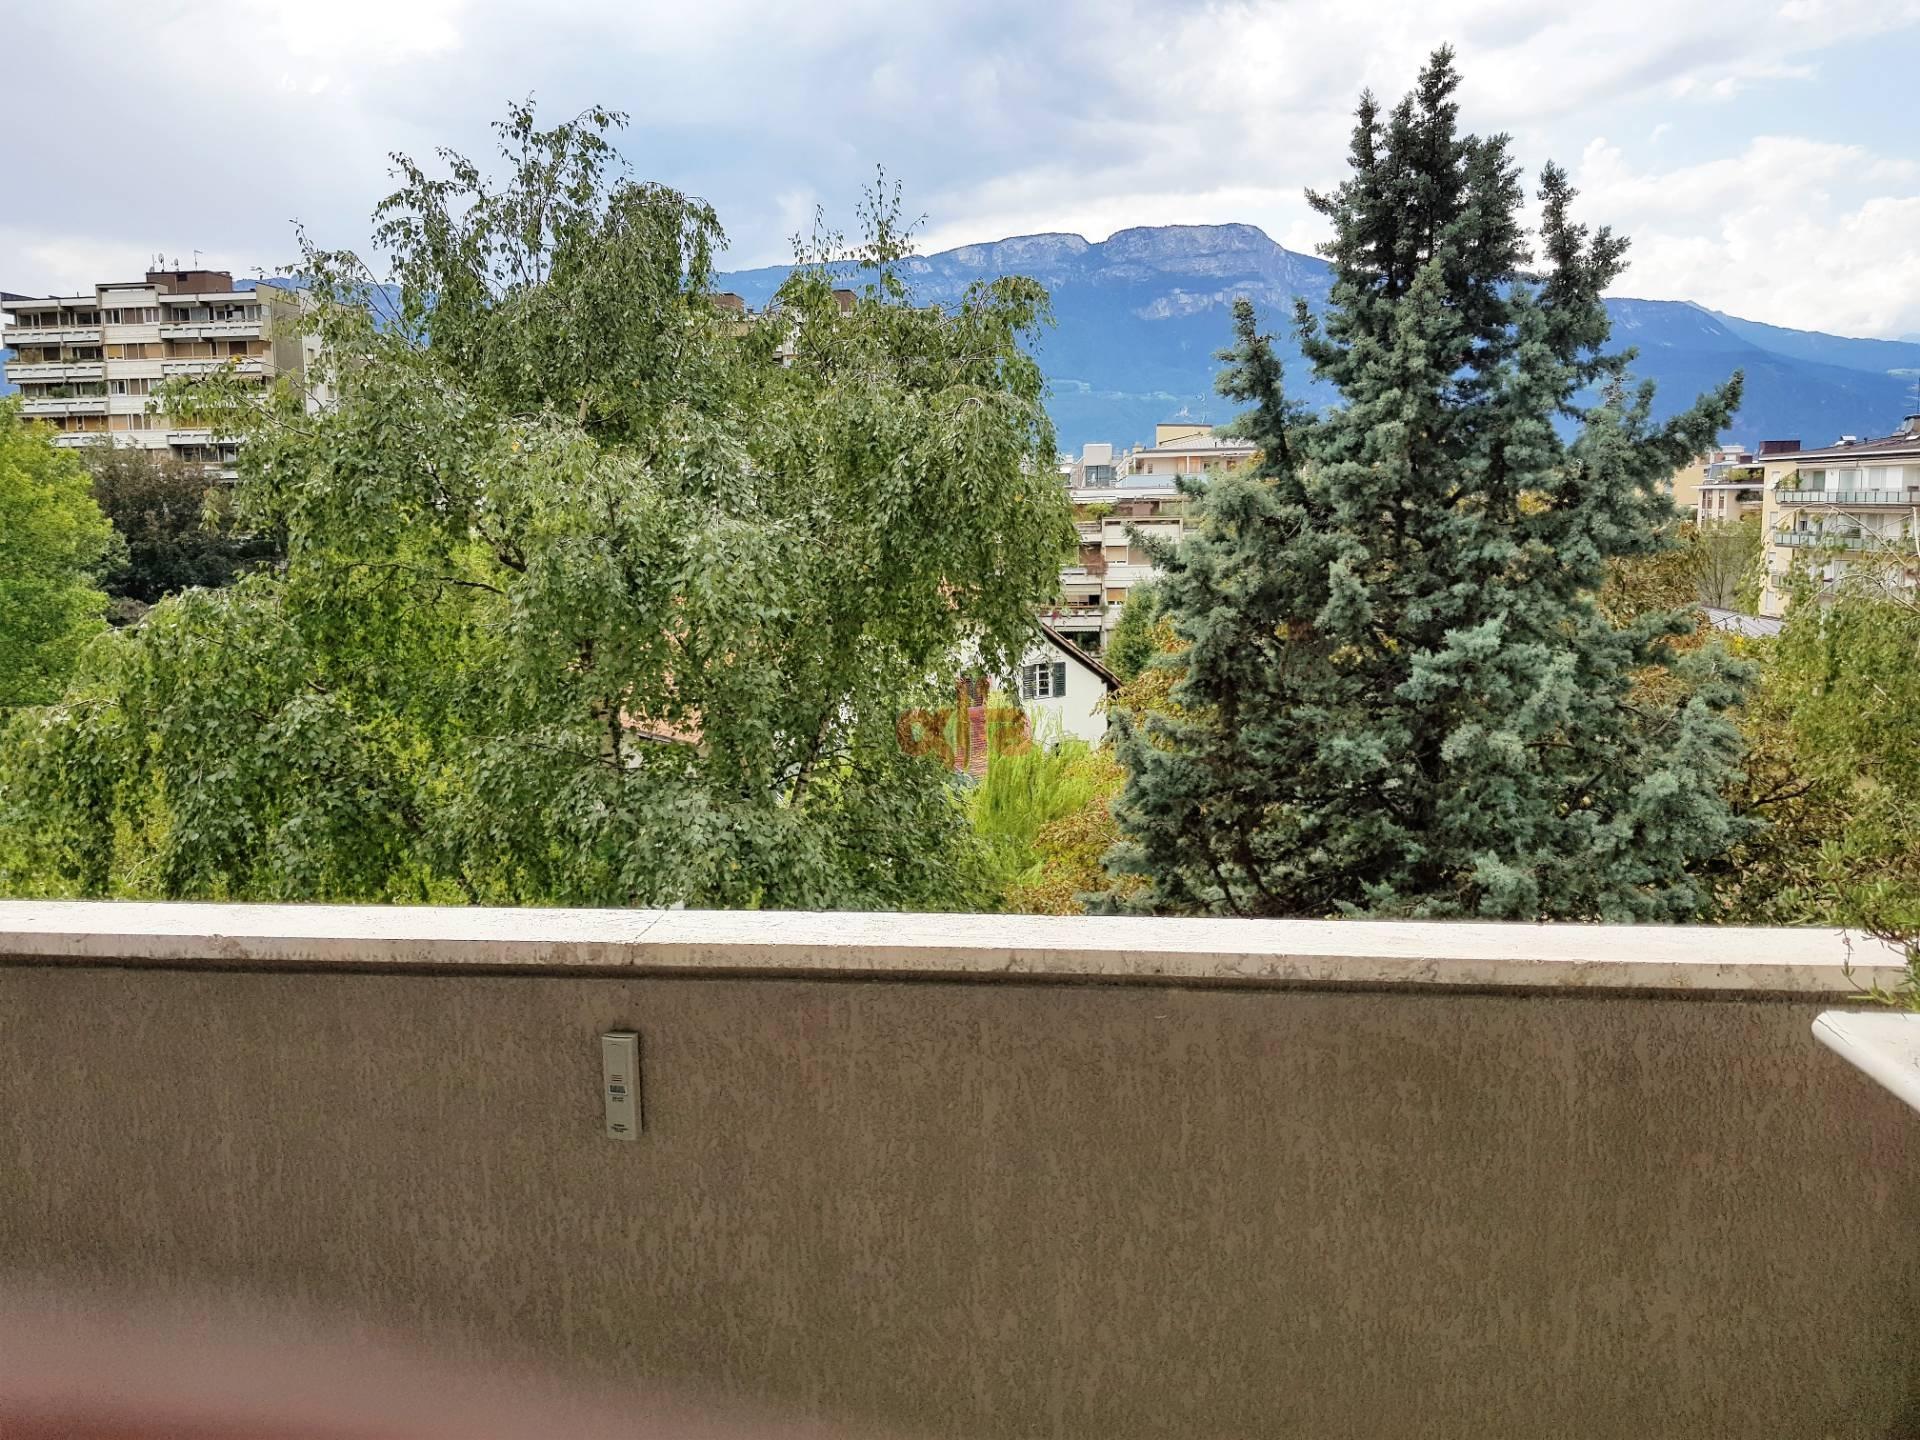 Bolzano - Bozen - Via Druso